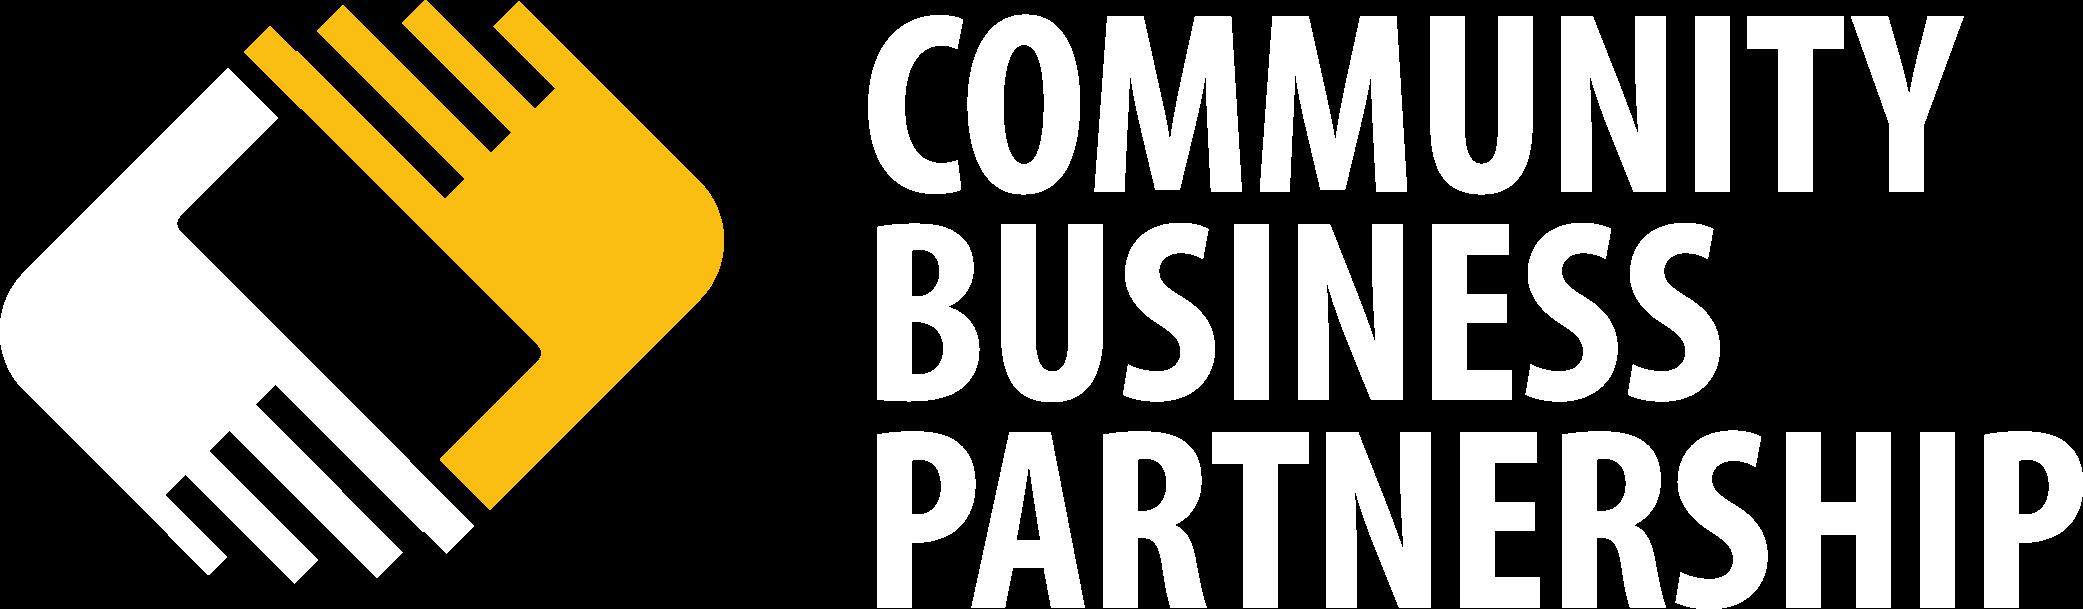 Community Business Partnership of Springfield, VA